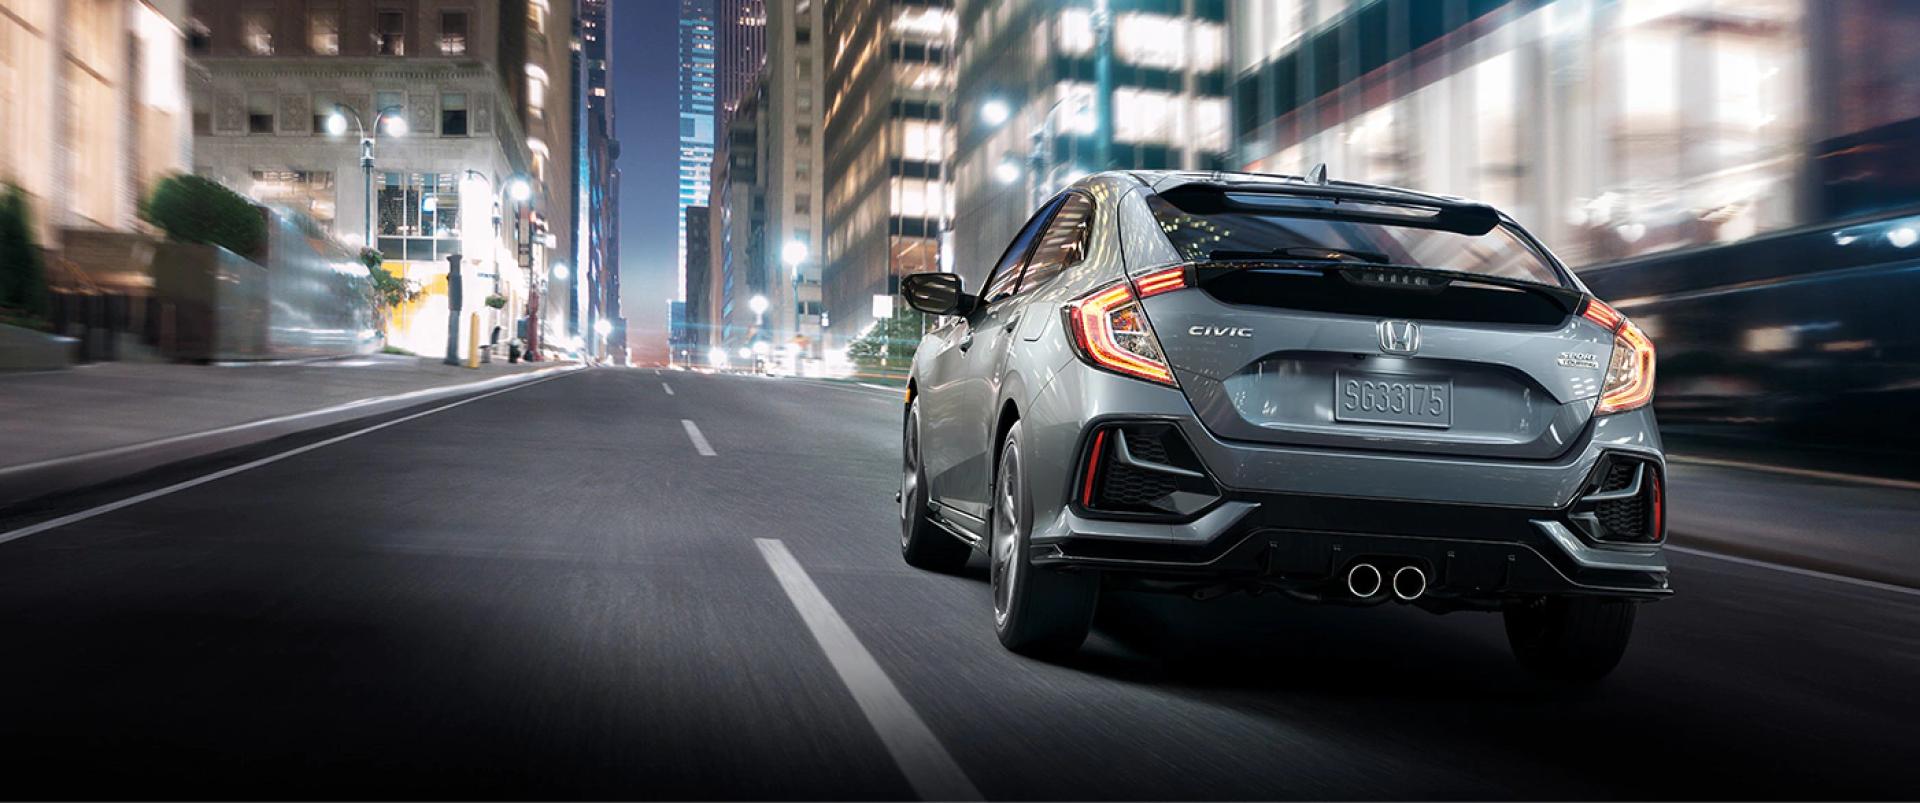 Honda_Civic_Hatchback_Driving_Rear_View